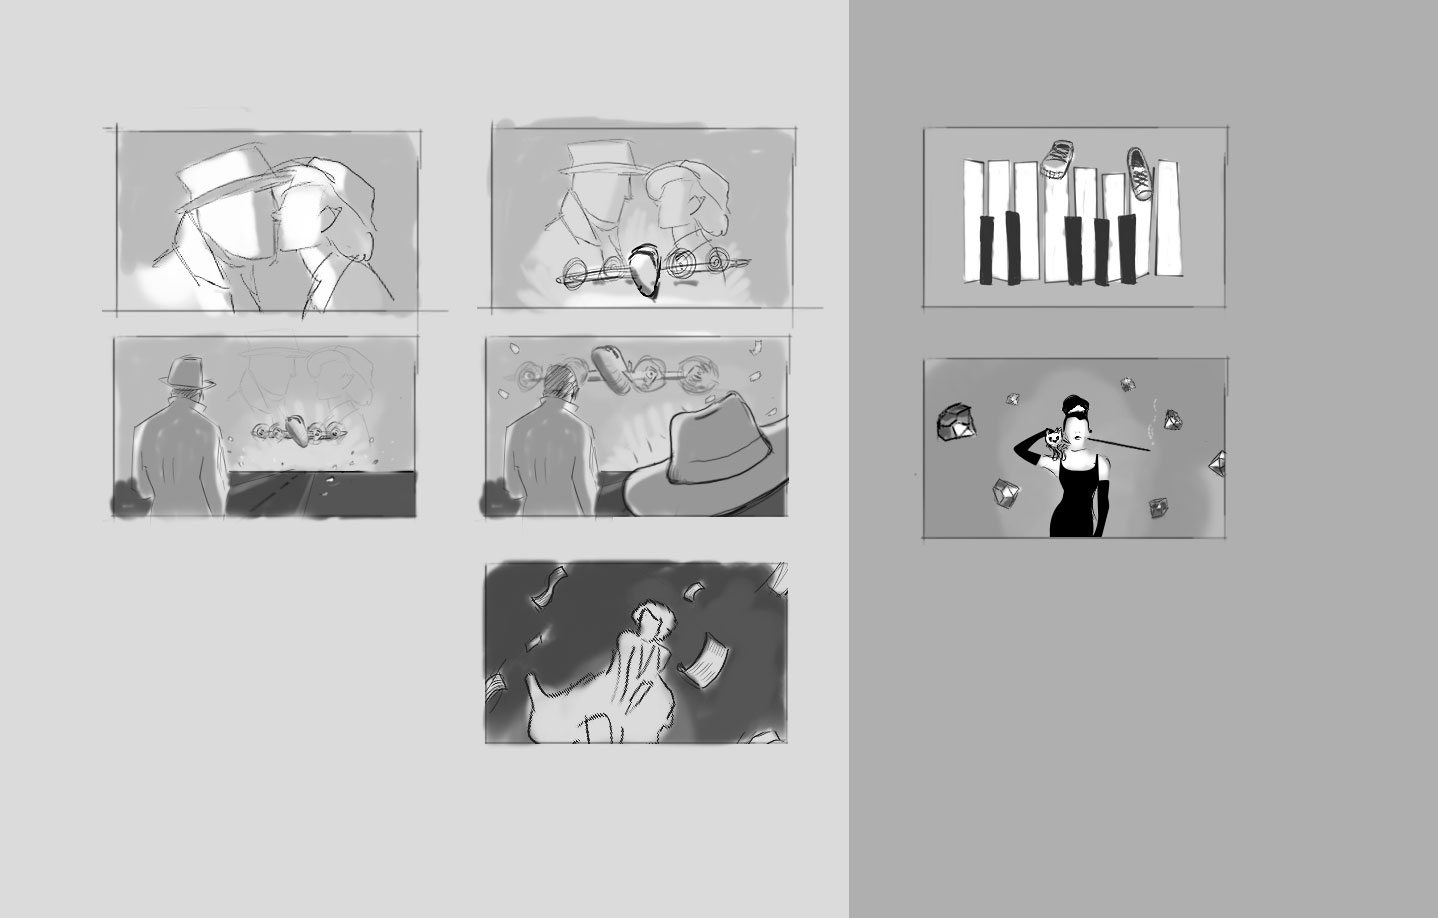 Alternative storyboards